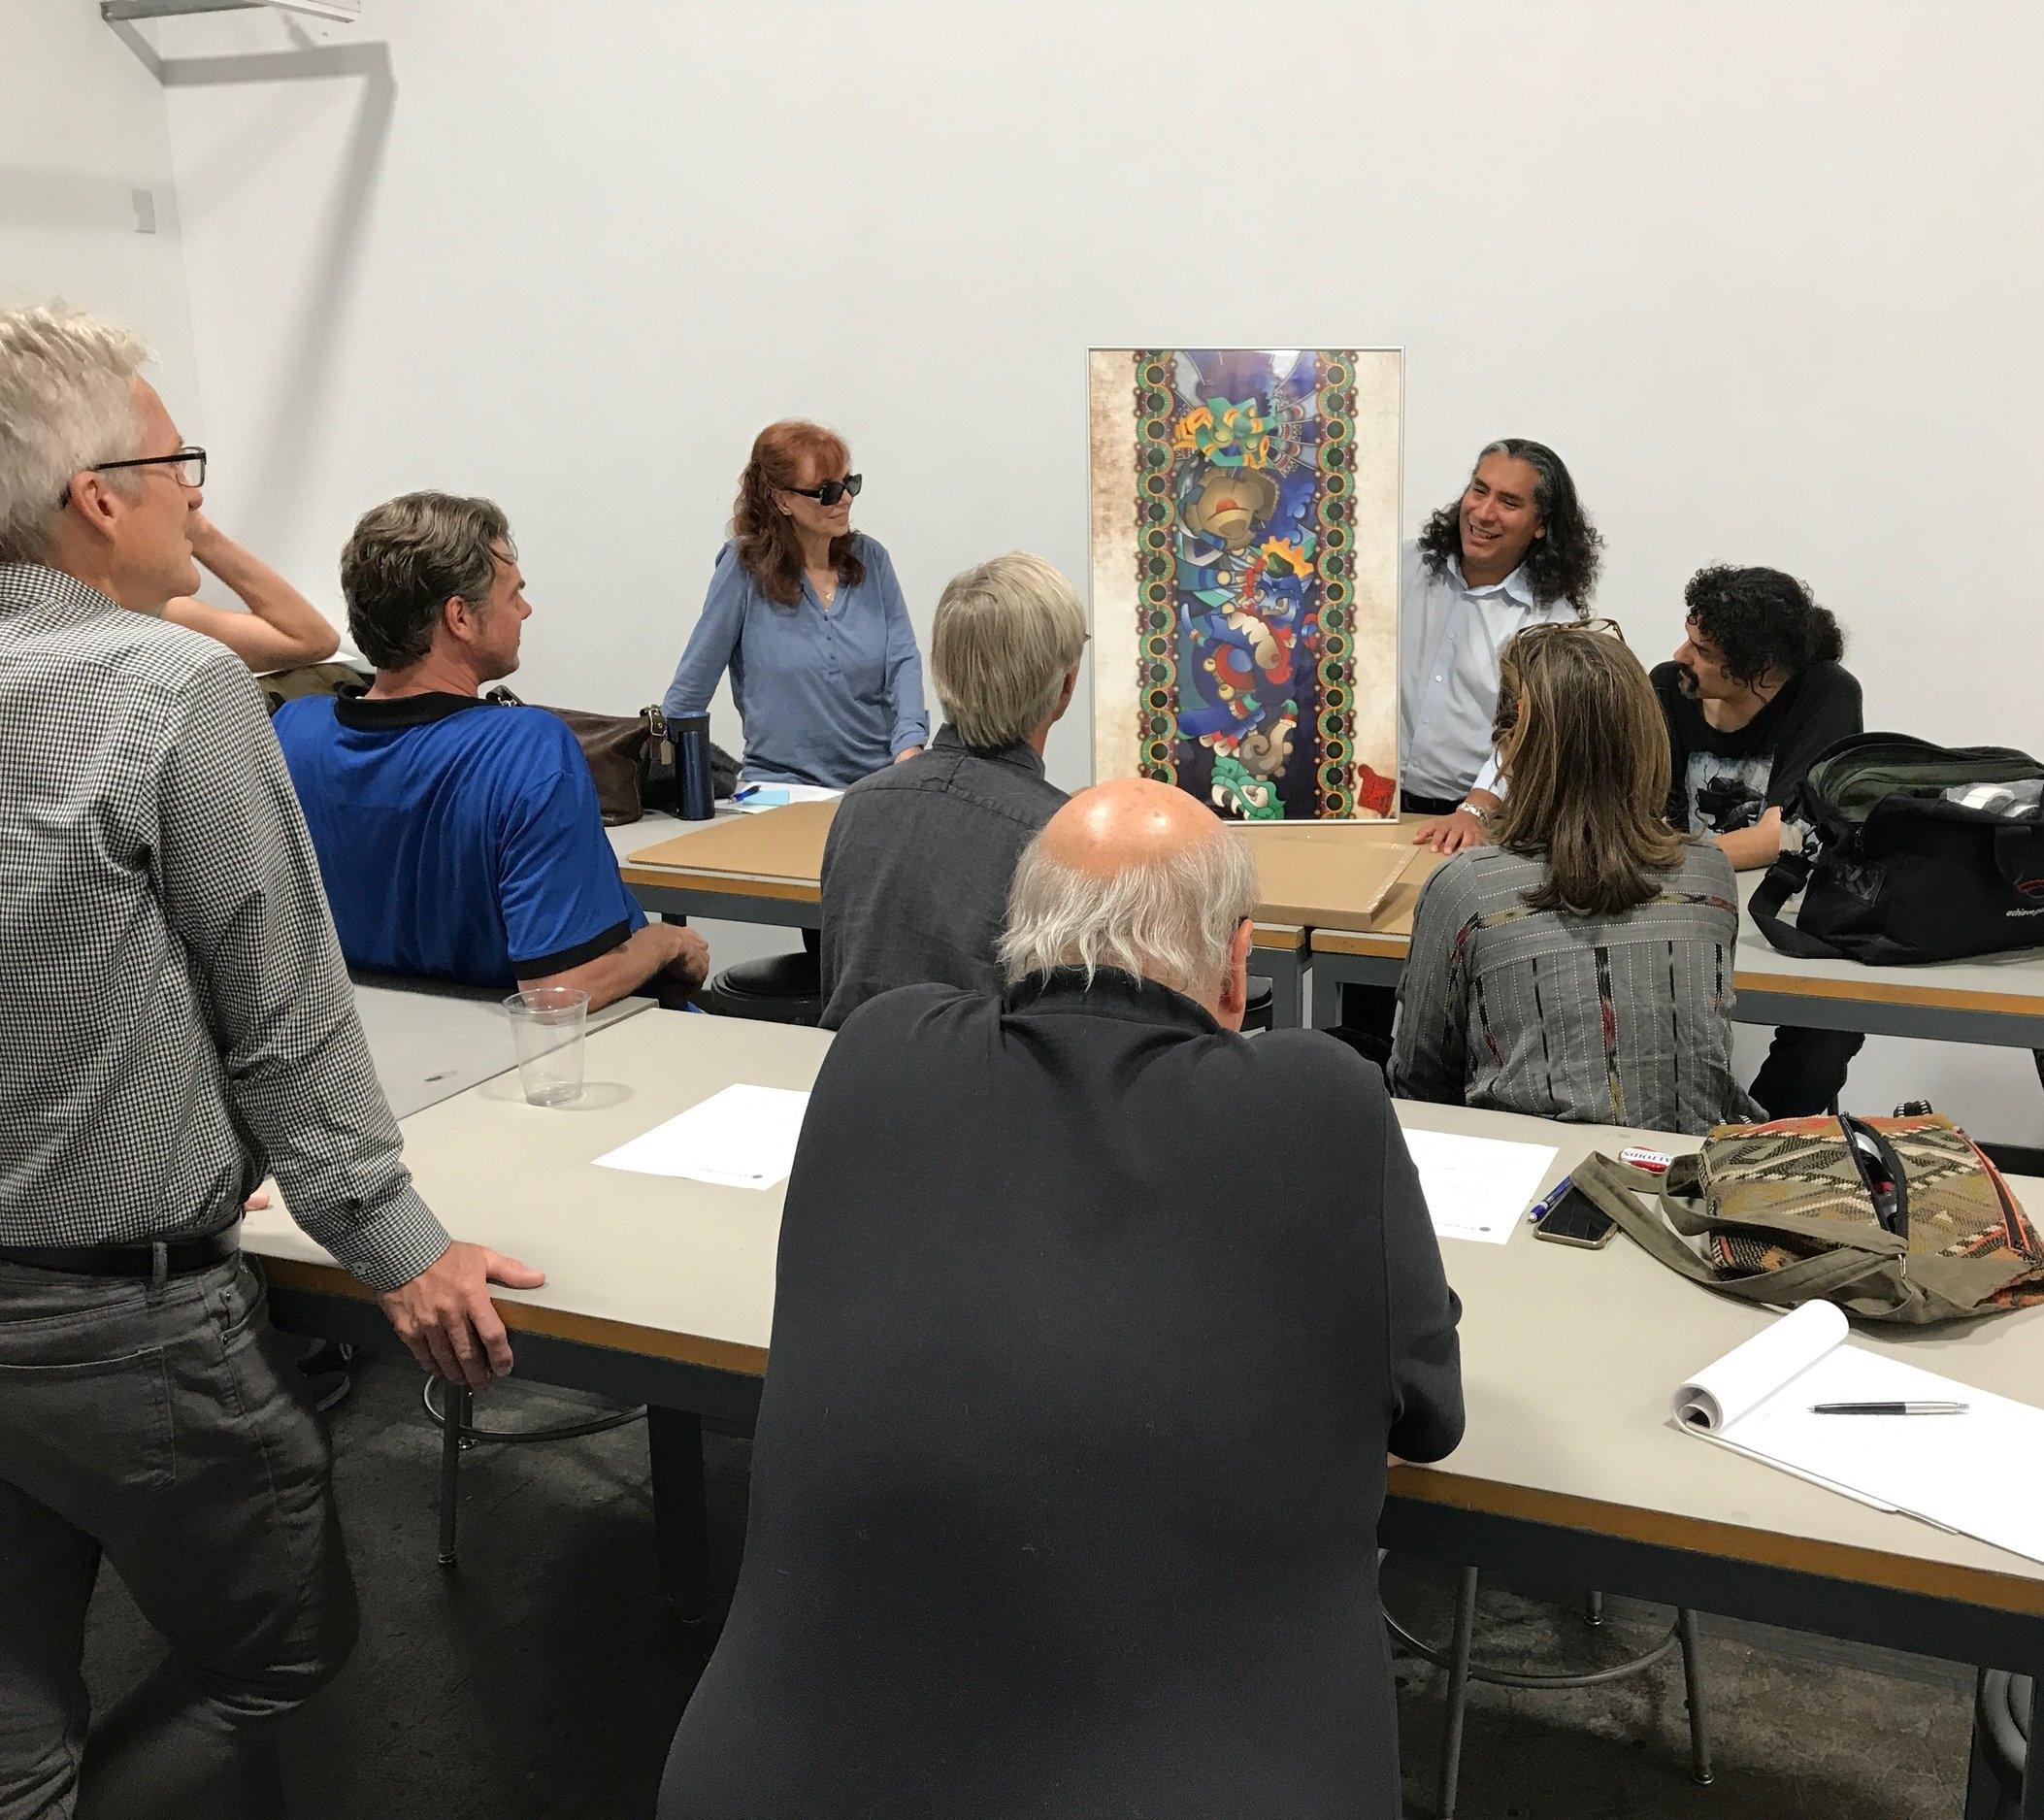 A schmoozeFest allows an artist to showcase his amazing work.